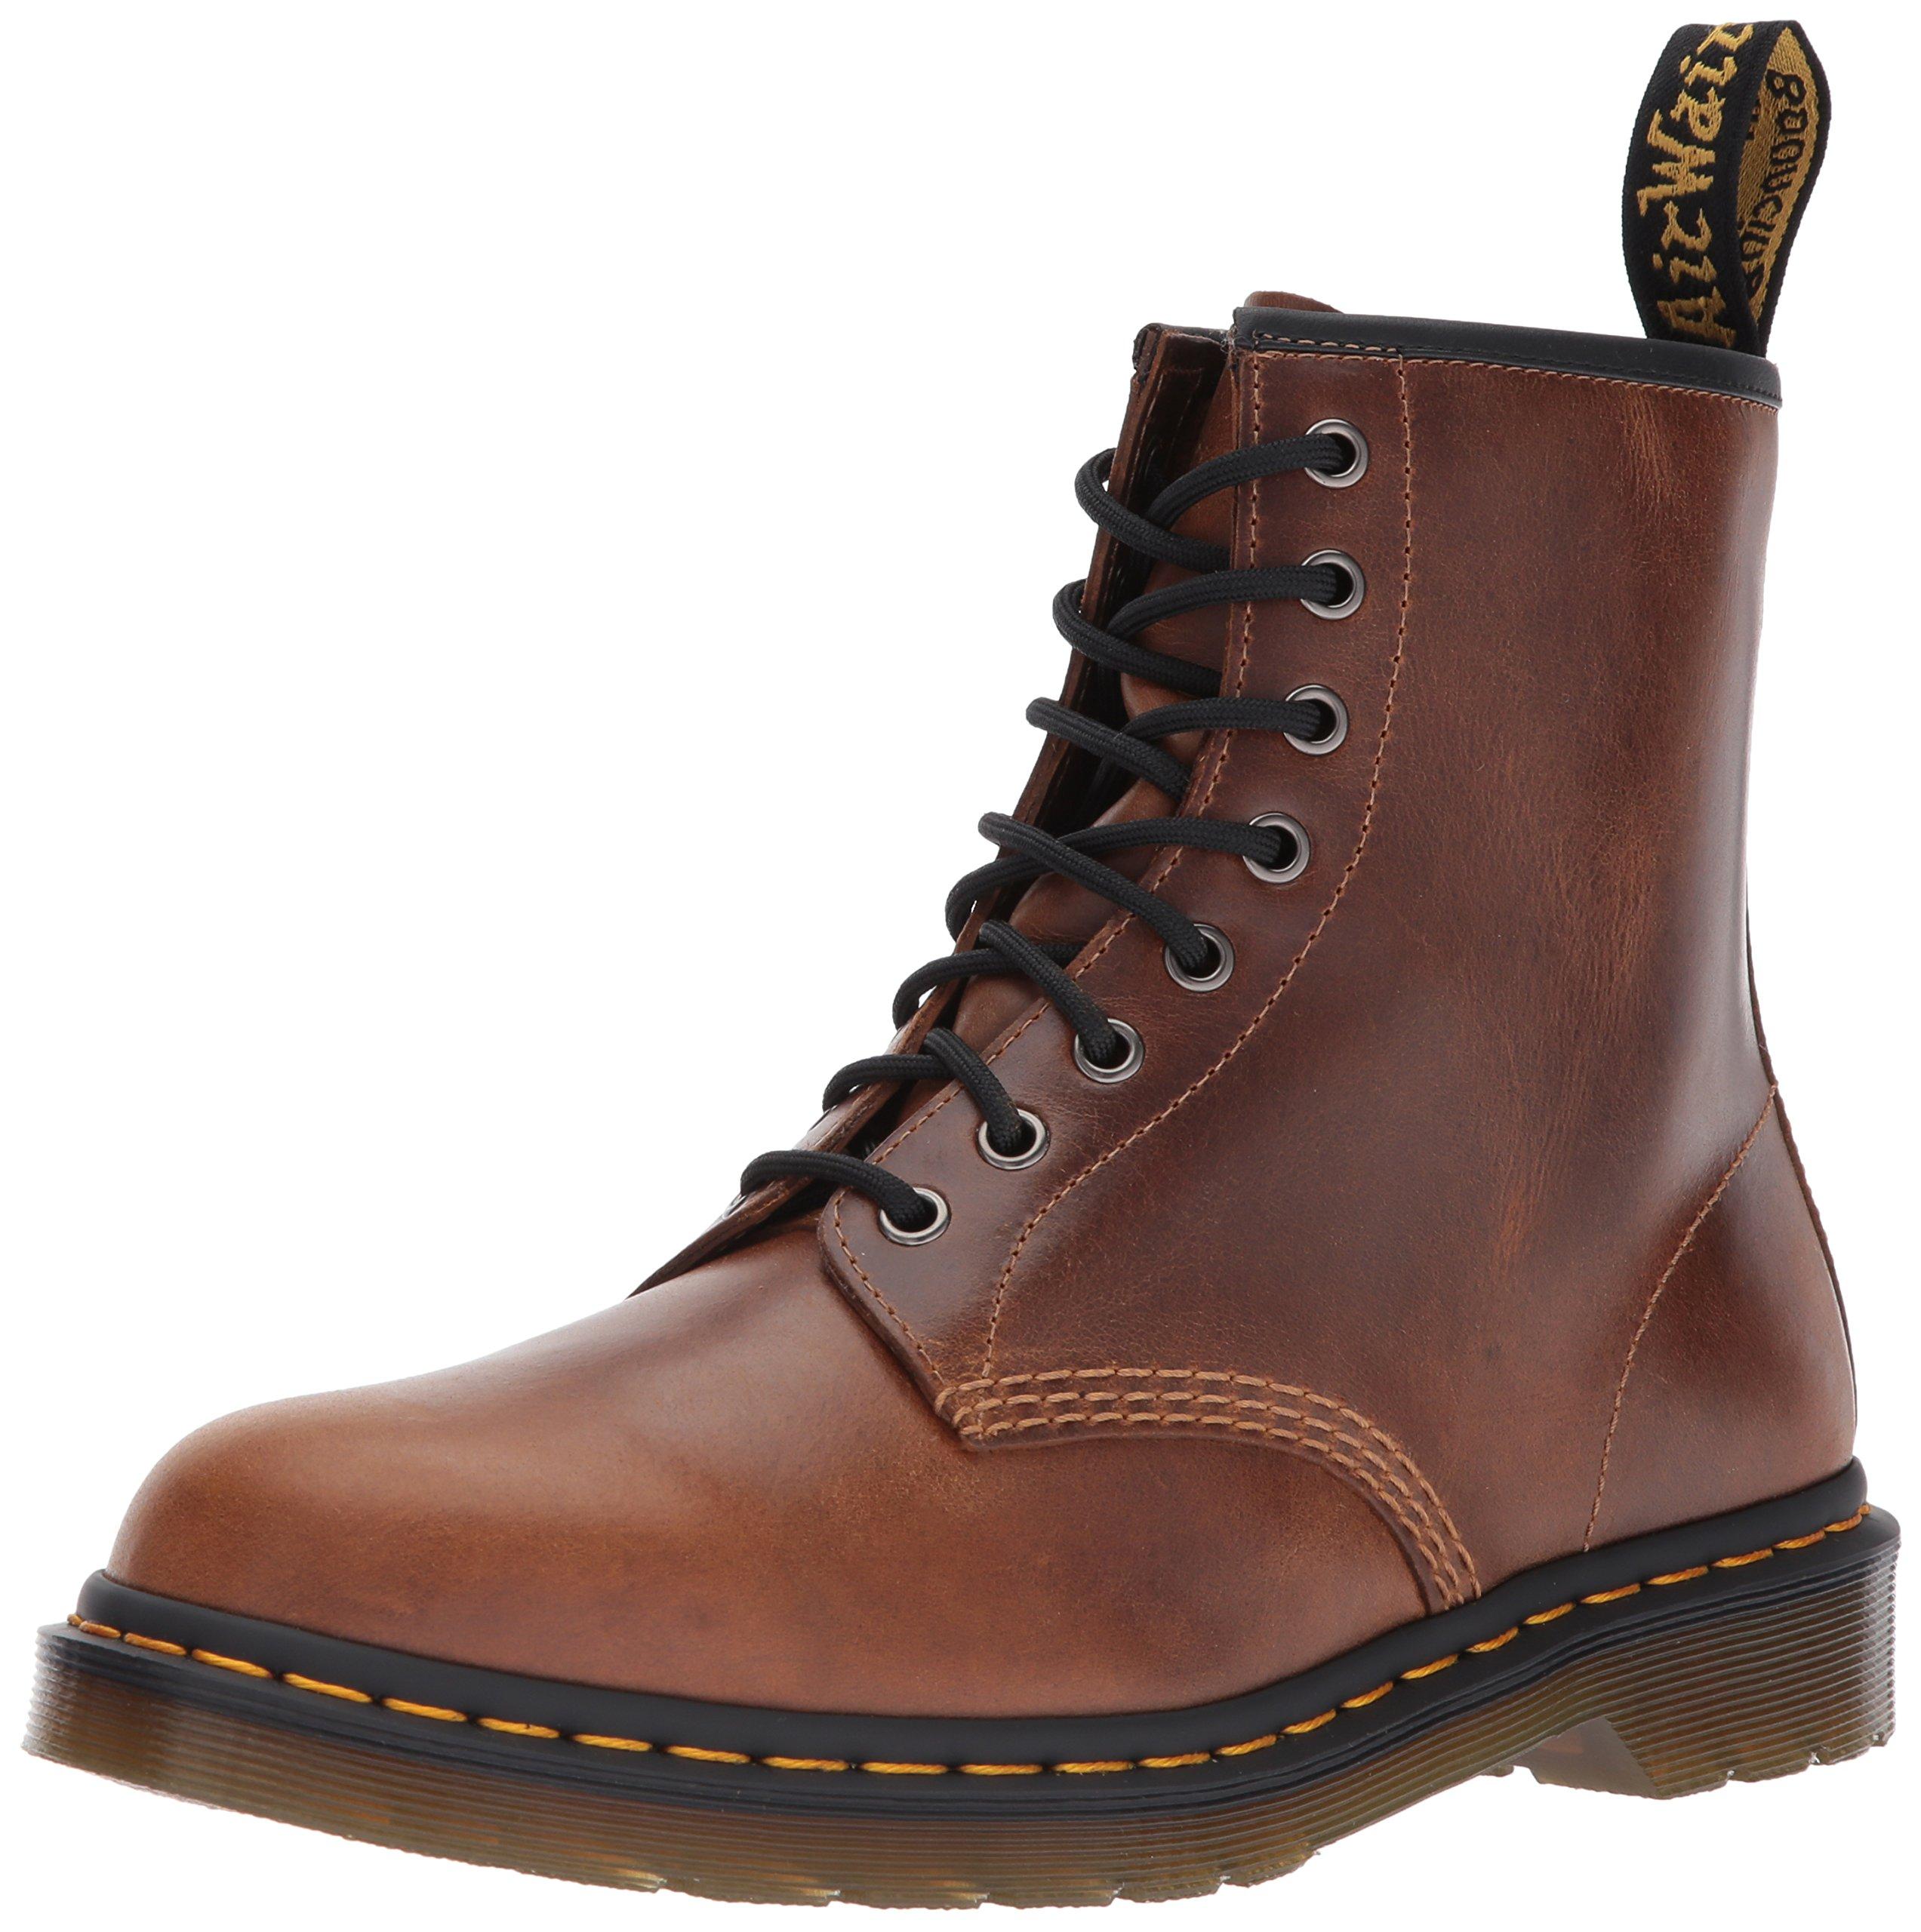 Dr. Martens Men's 1460 Combat Boot, Butterscotch, 9 Medium UK (10 US) by Dr. Martens